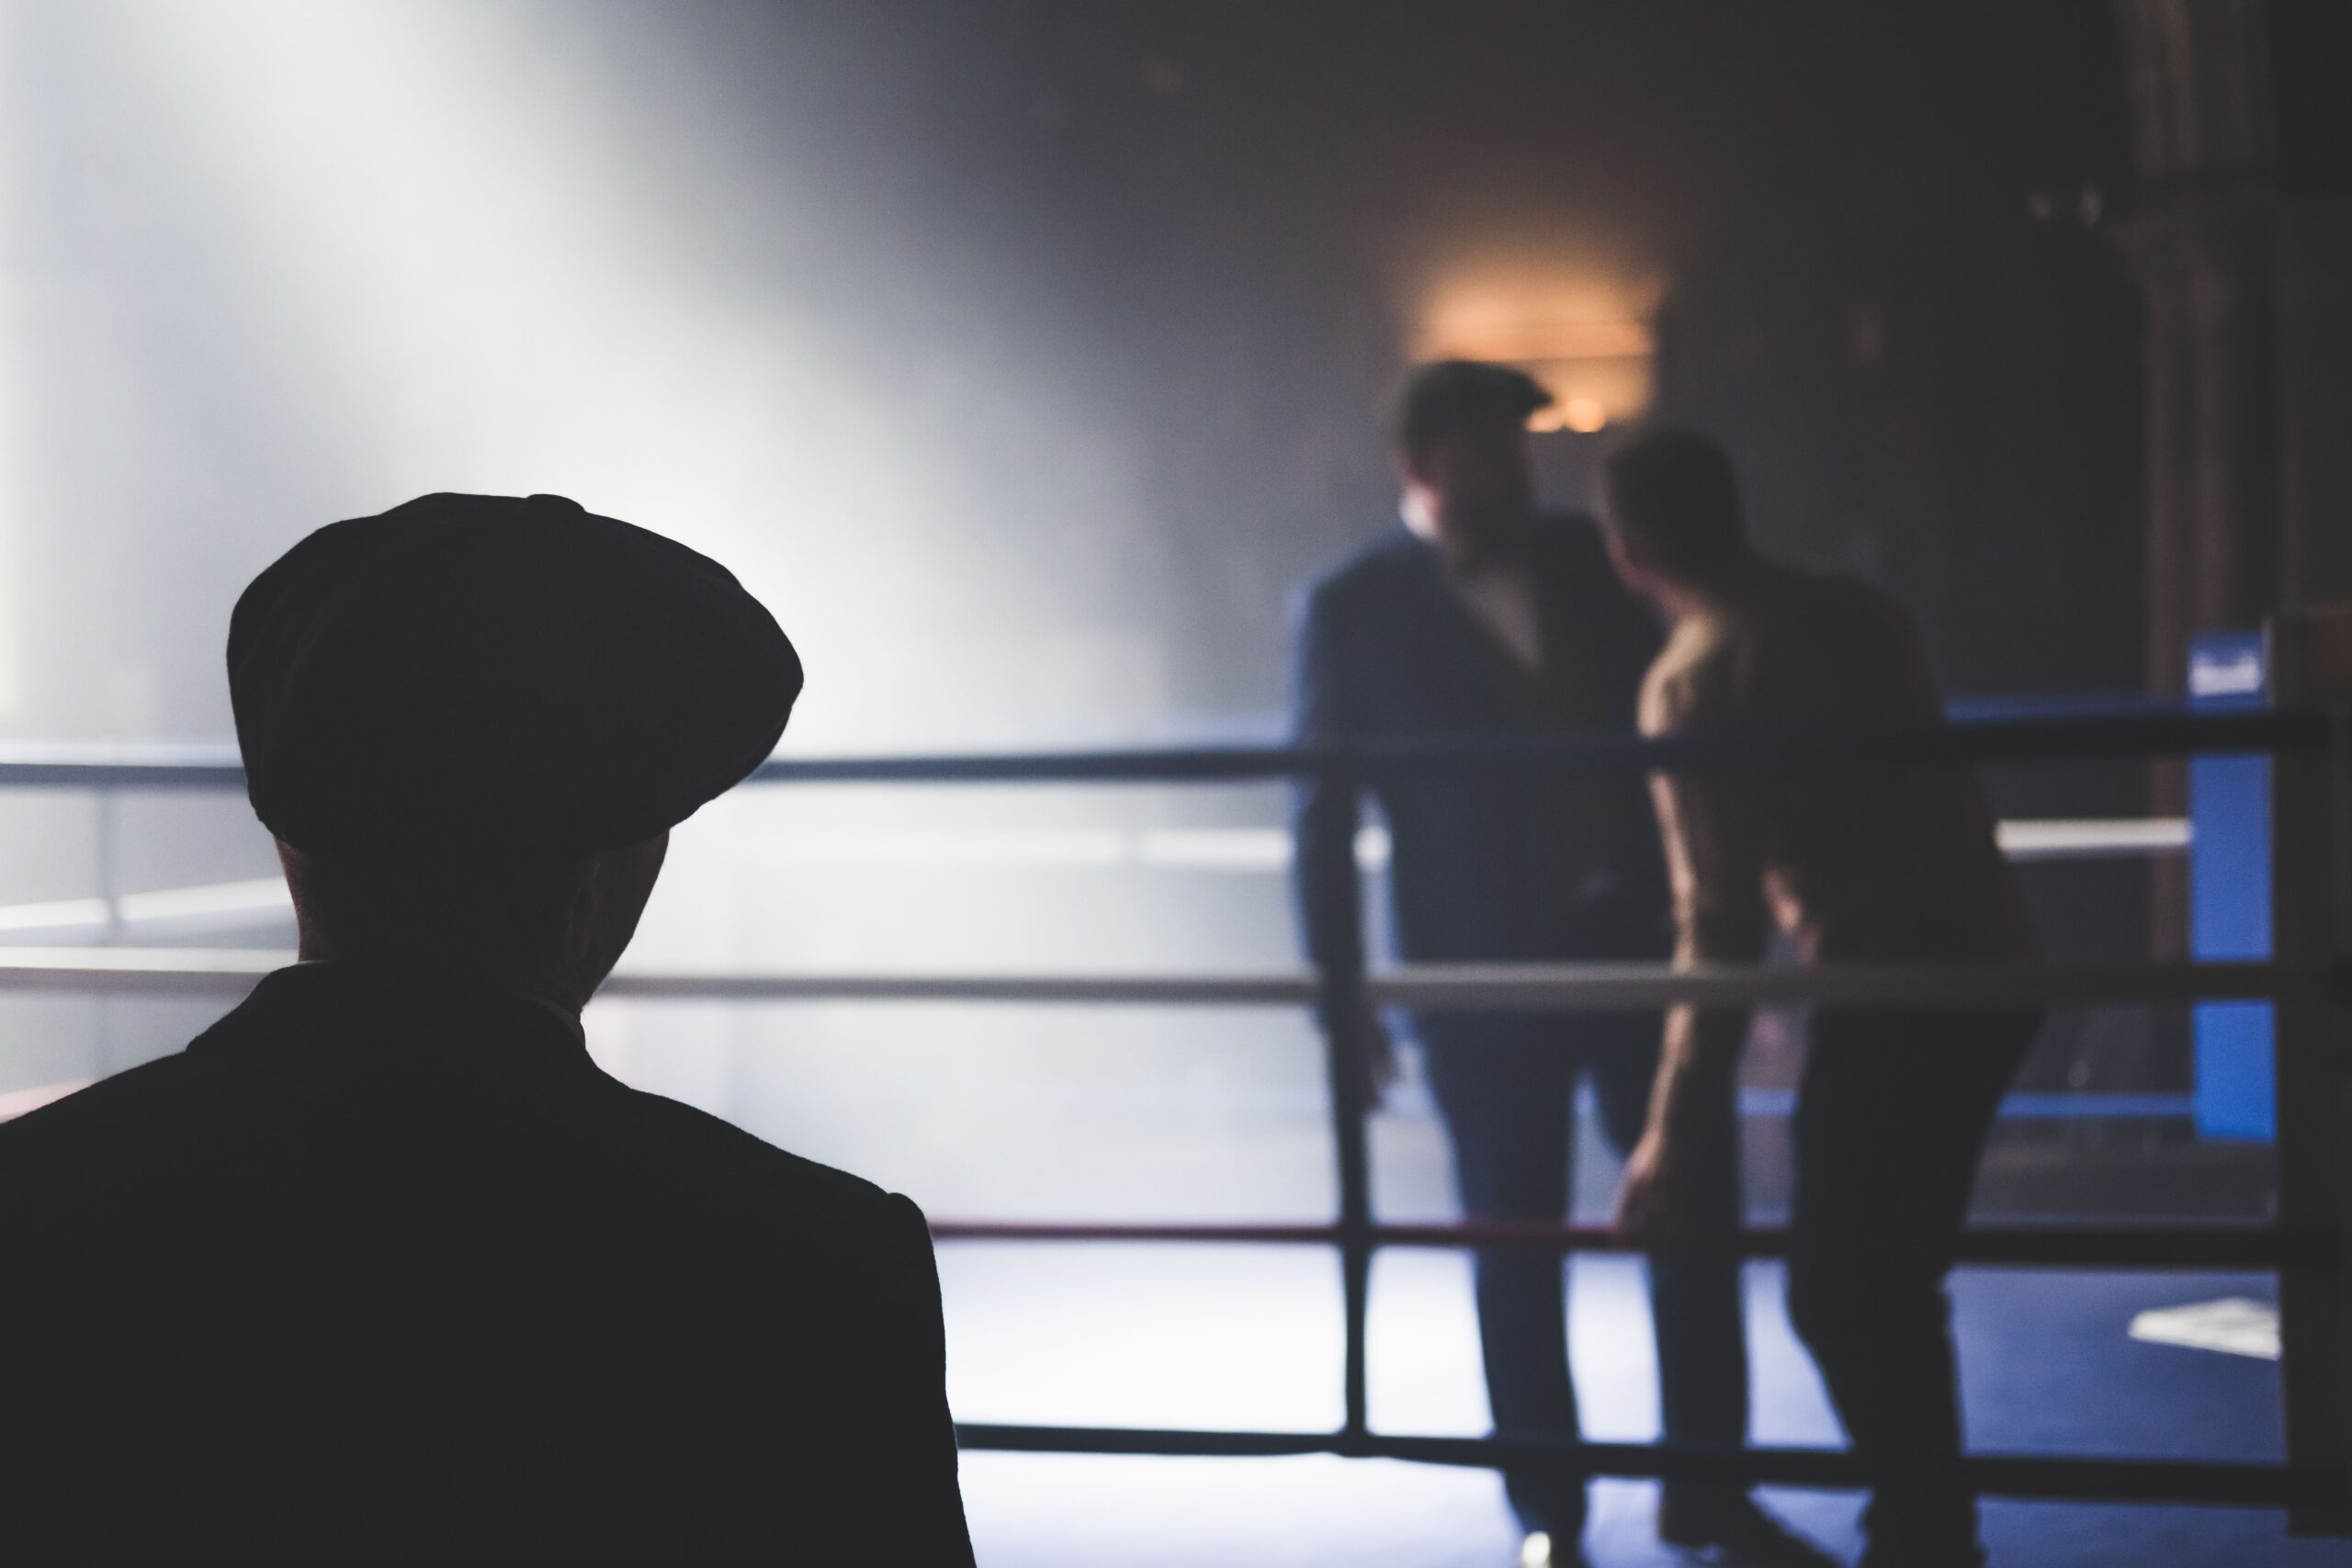 A scene in a boxing ring two men film noir Dan Burton image from Unsplash